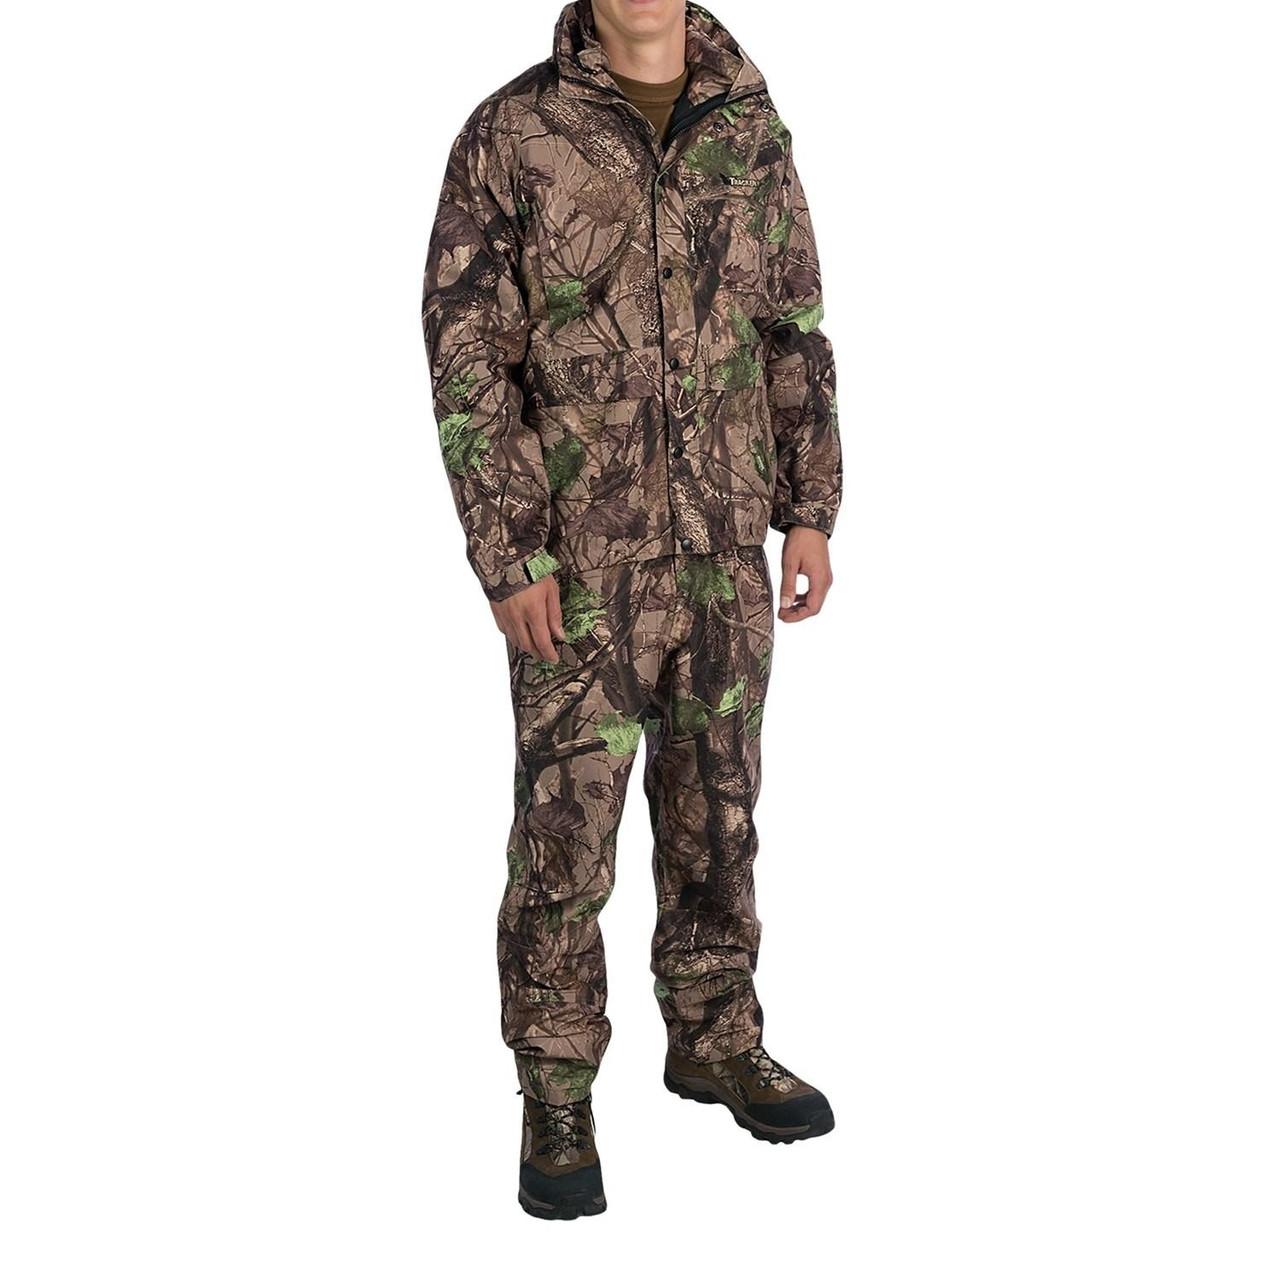 Костюм охотничий утепленный Tracker 3-in-1 Jacket/Pants Set - Waterproof, Insulated